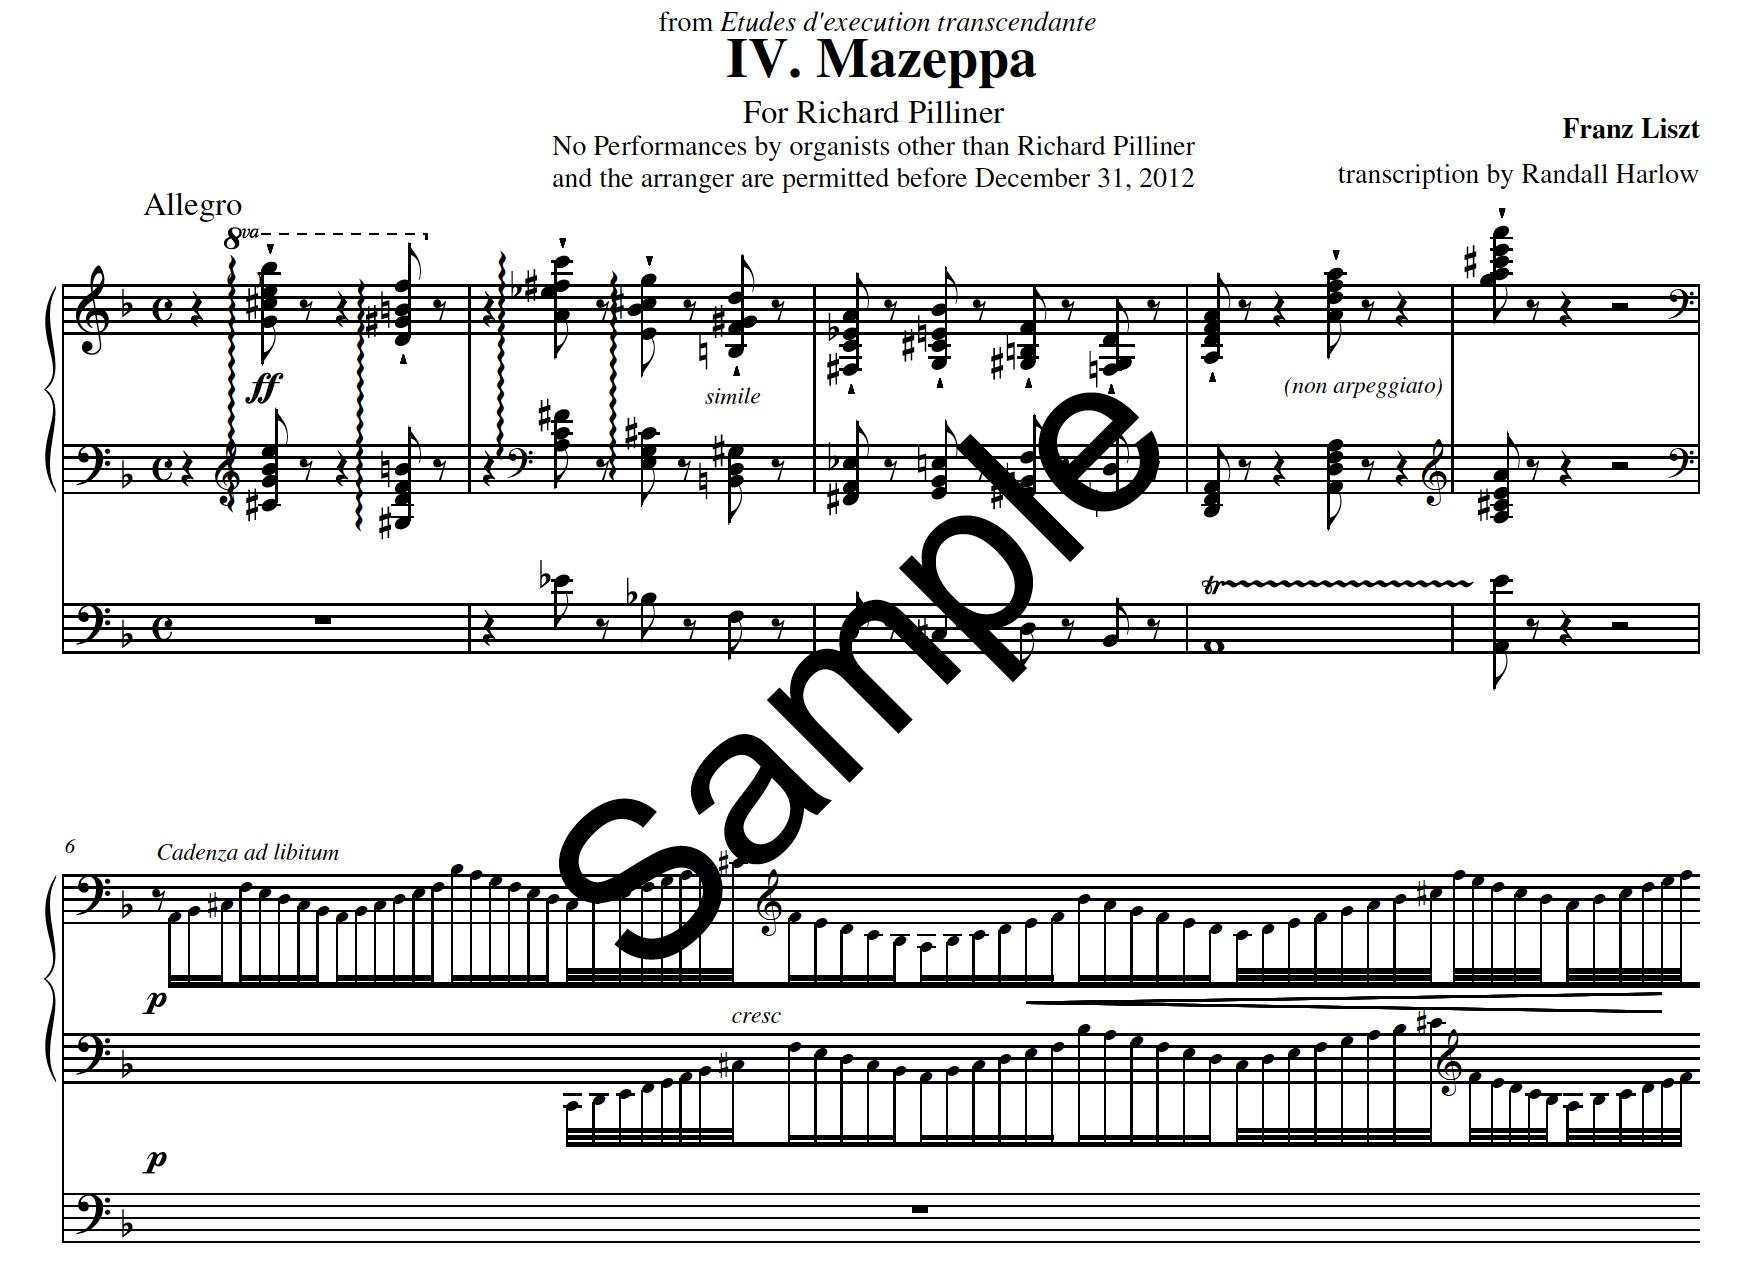 Liszt Transcendental Etudes Mazeppa transcribed for organ